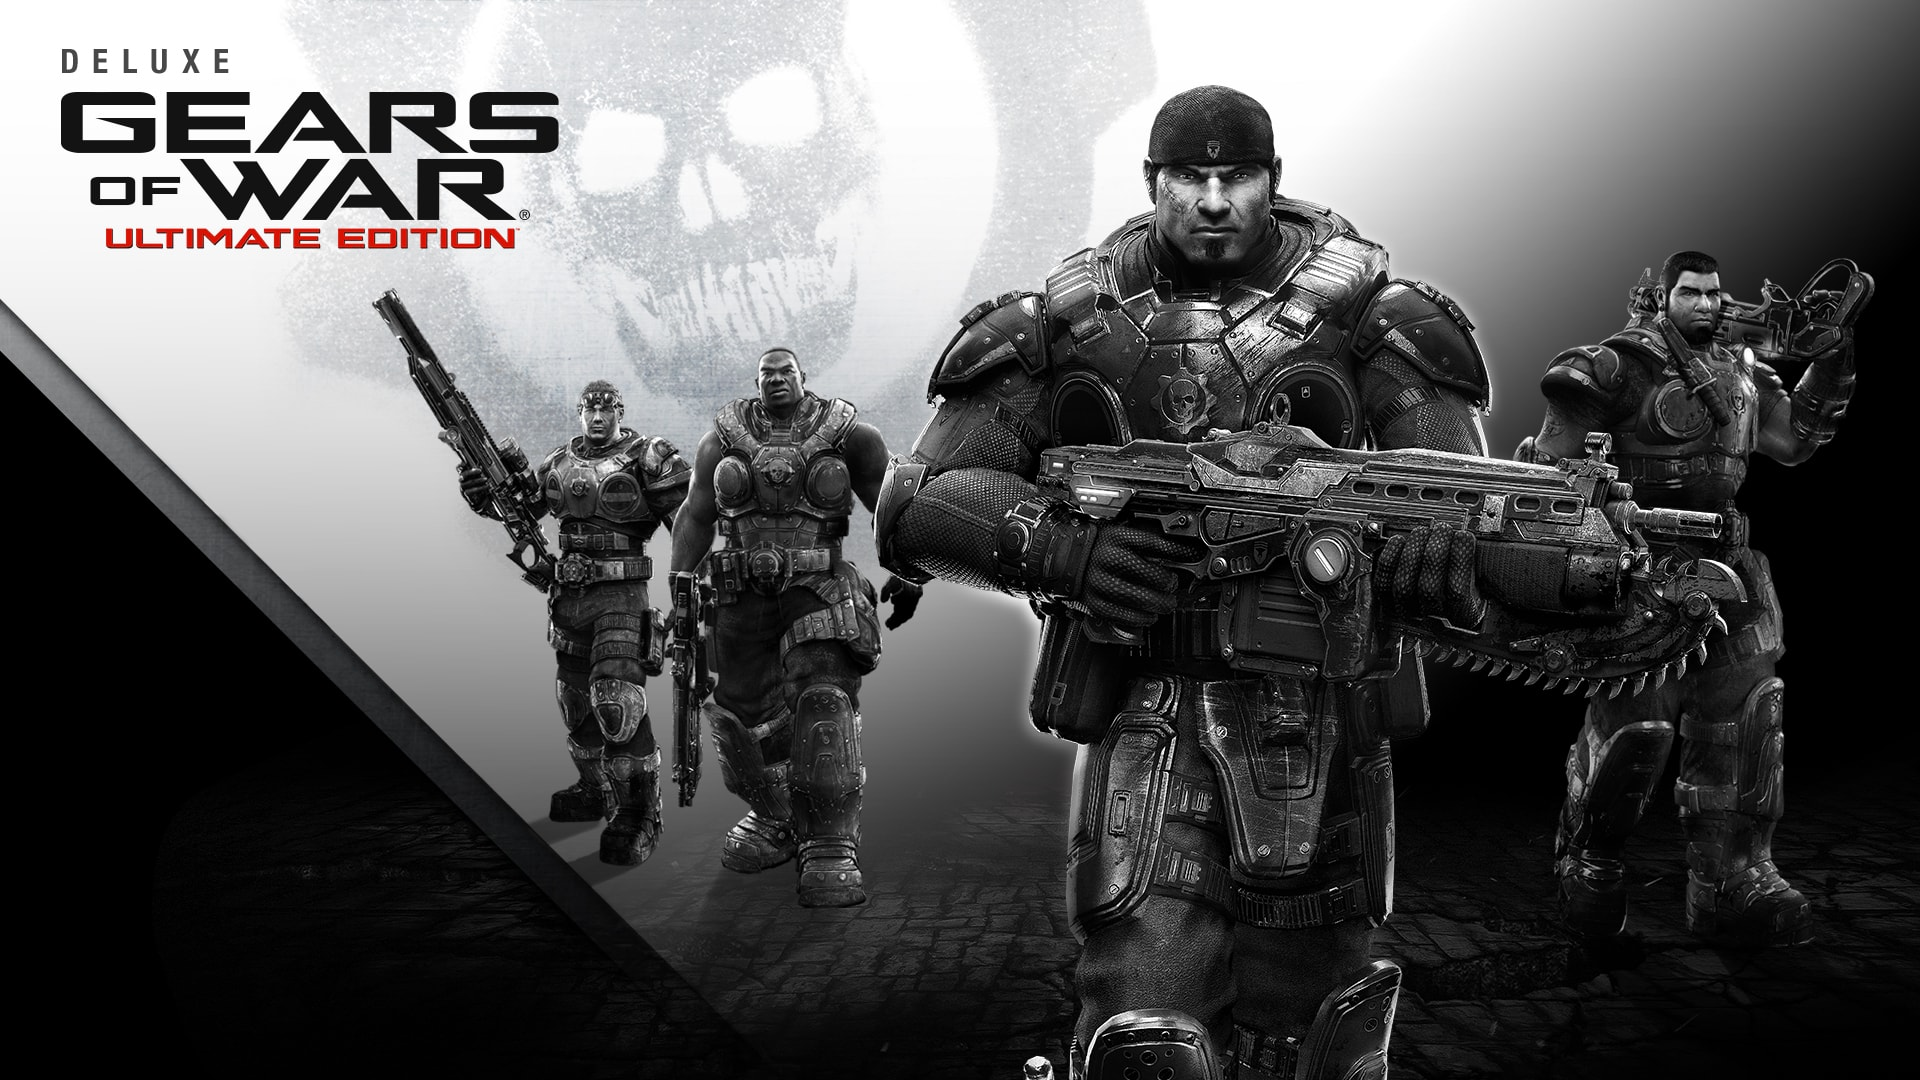 Gears Of War Ultimate Edition Hd Wallpapers 7wallpapers Net